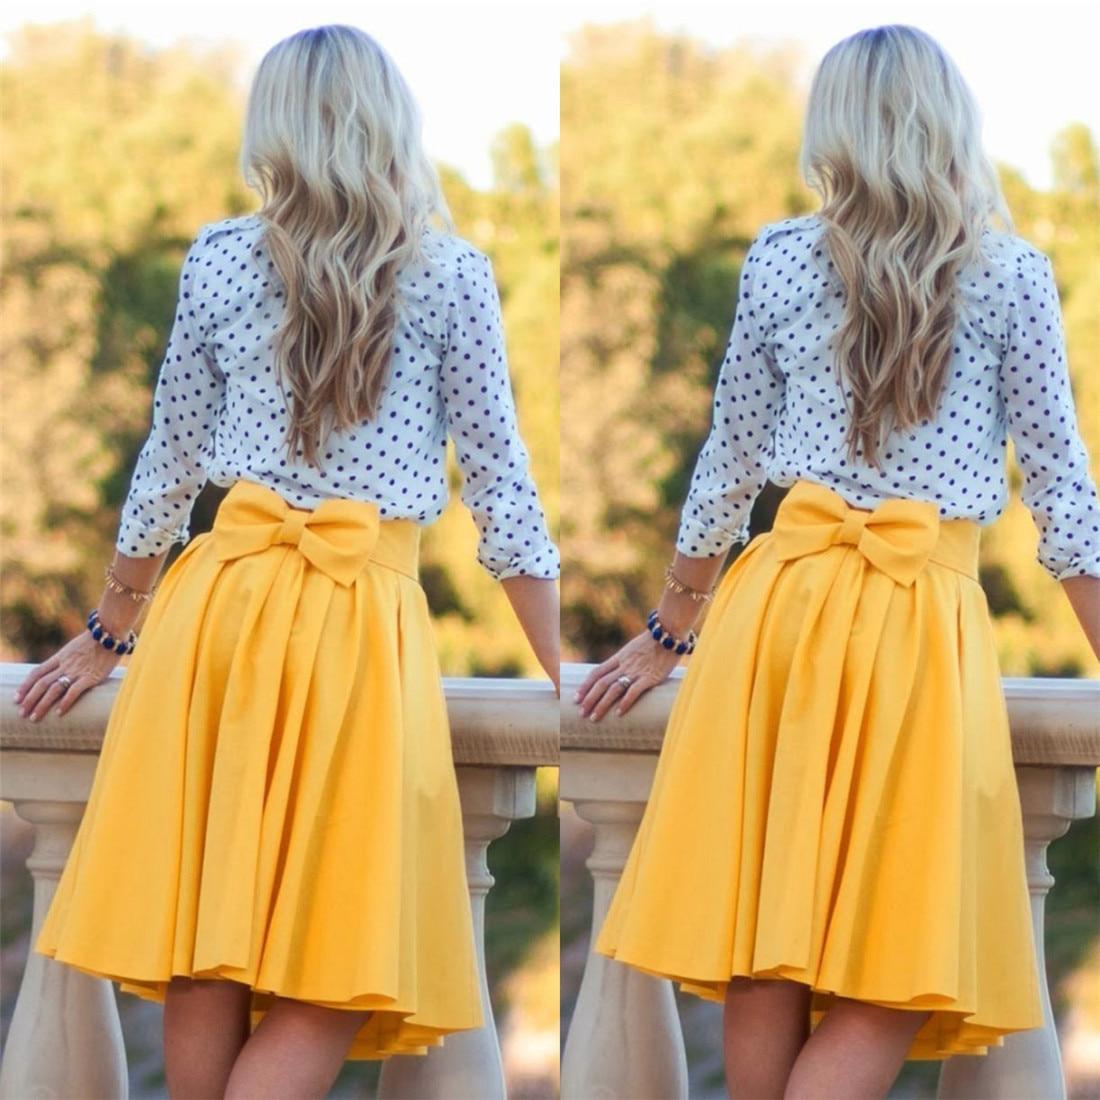 0e9825c8043f Jupe patineuse jaune longue jupe rose